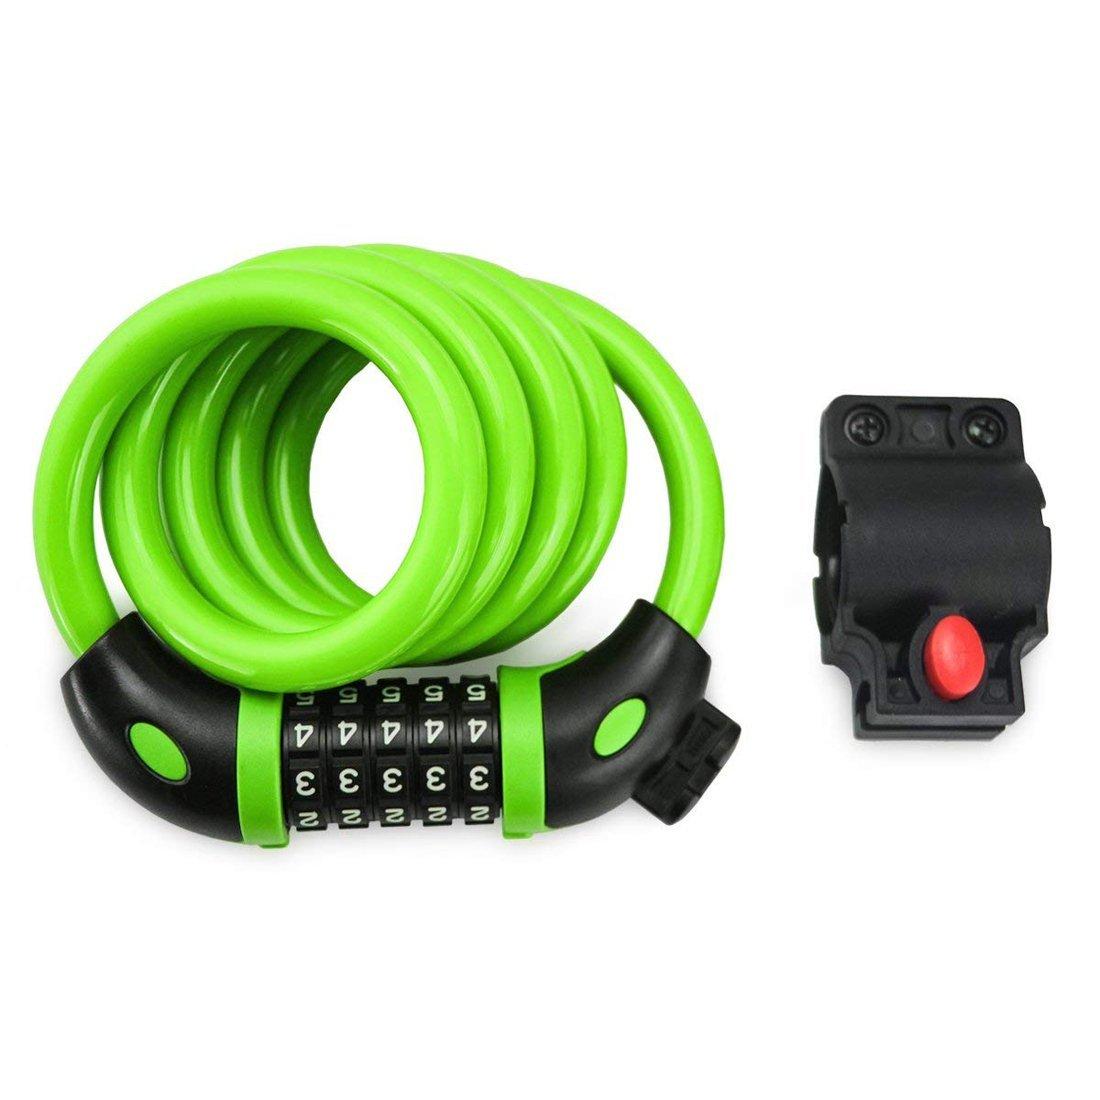 NDakter~ Purple Combination Cable Chain Bike Lock ~ 4 Feet x 1//2 Inch